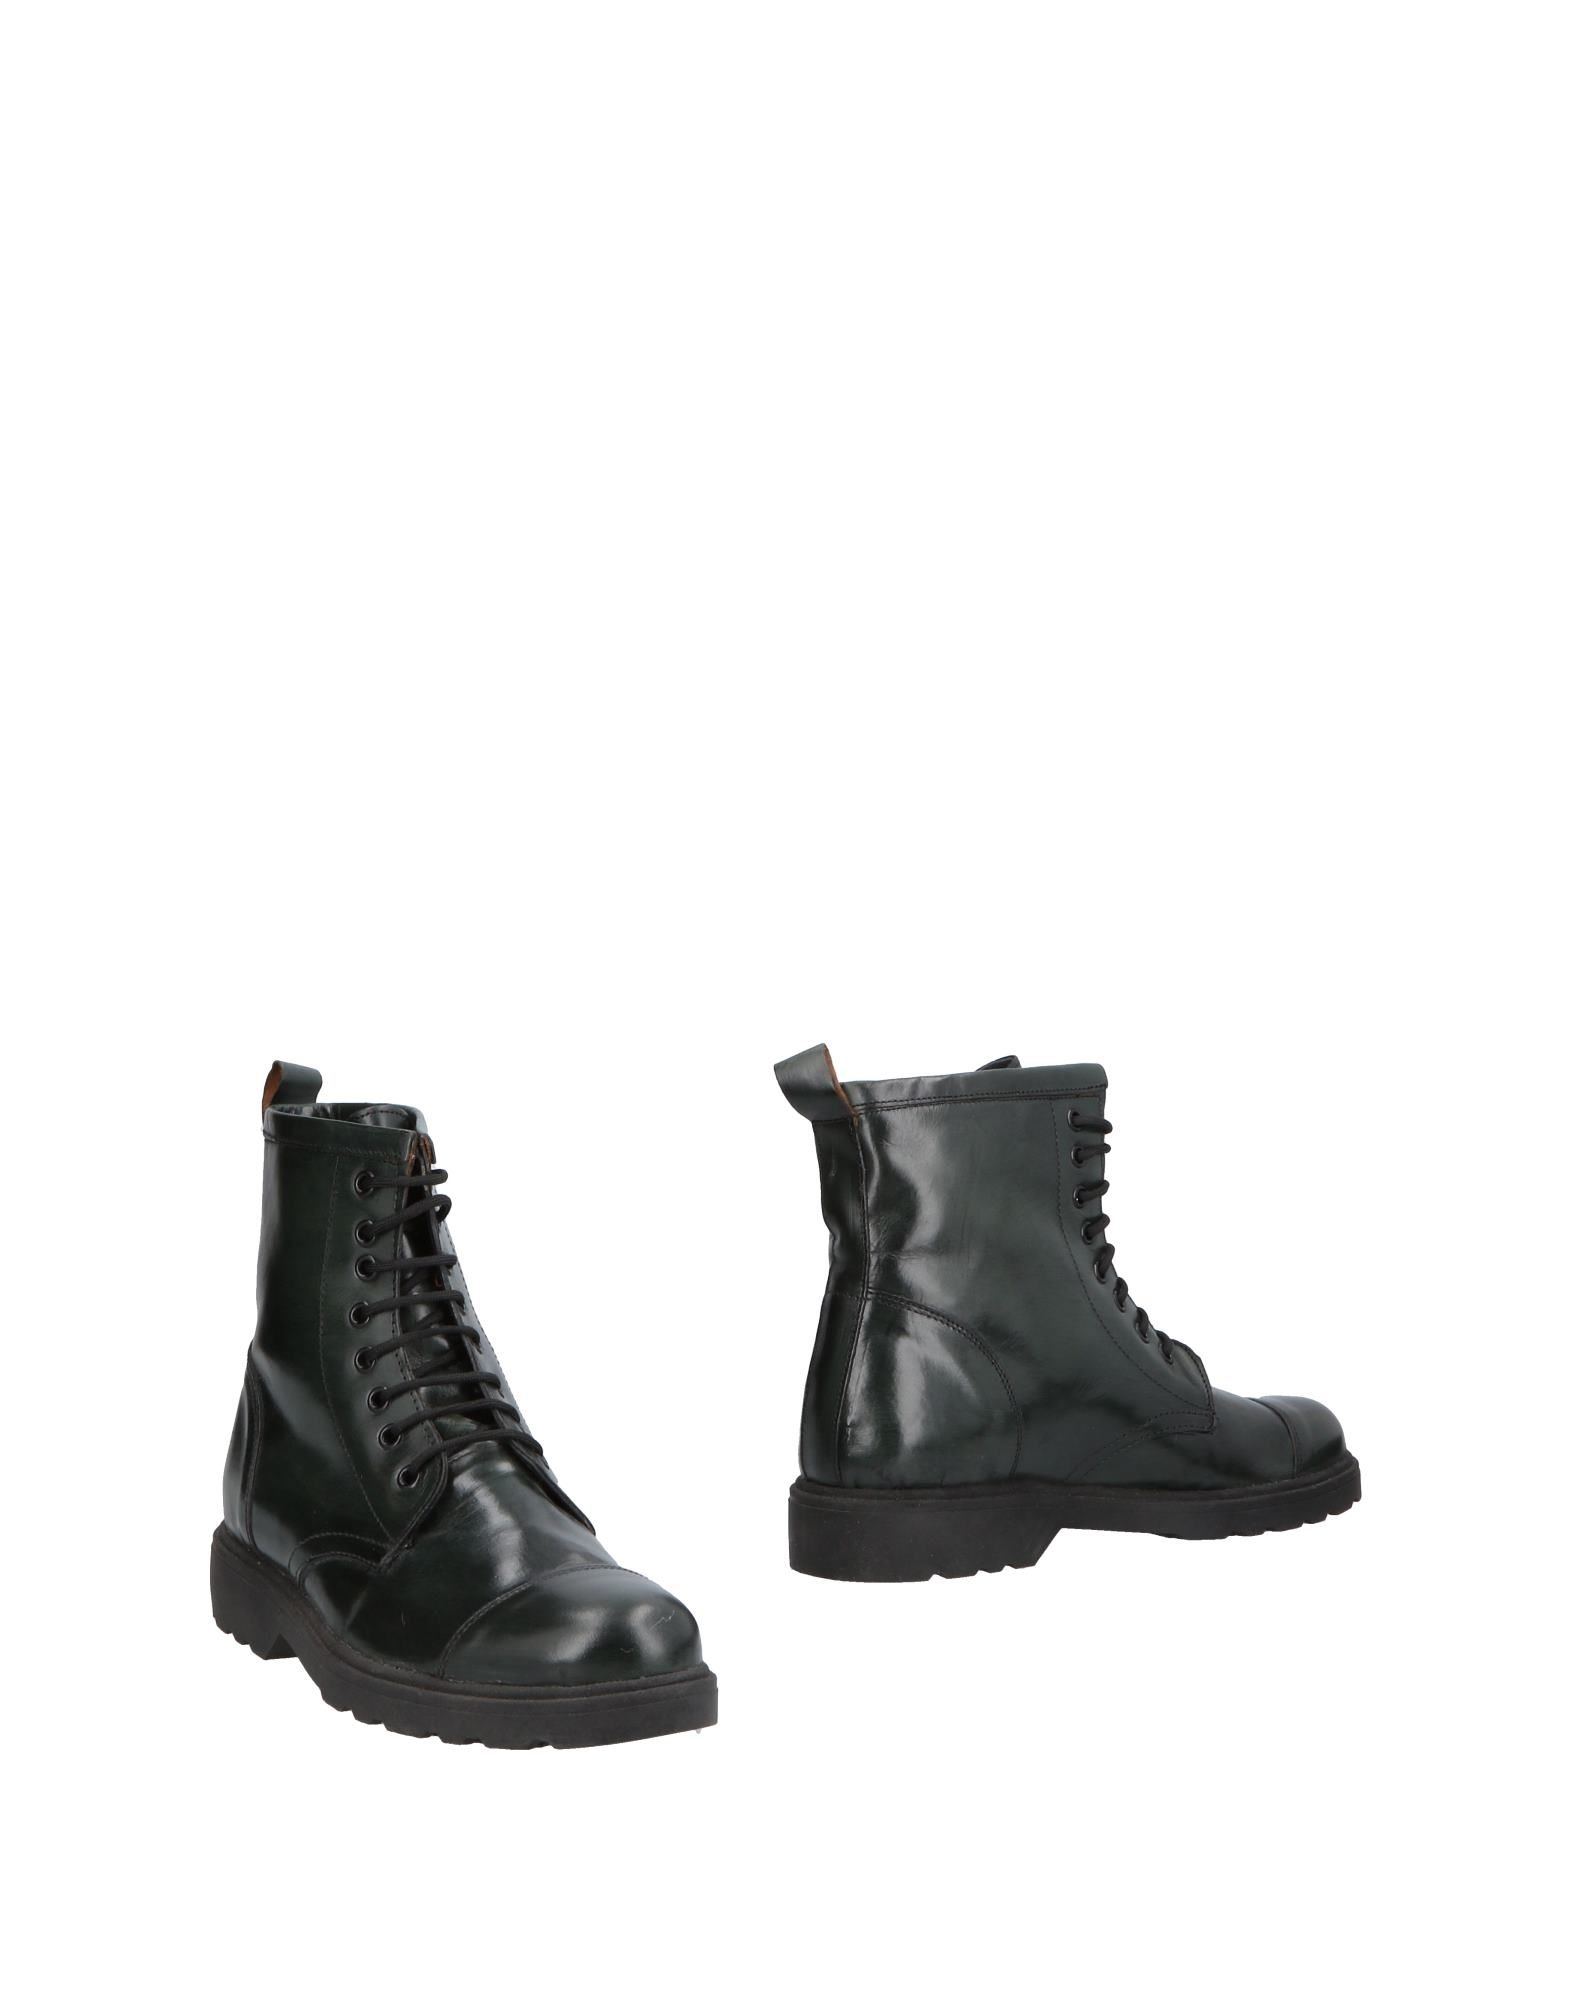 Rabatt echte Schuhe Tsd12  Stiefelette Herren  Tsd12 11504310OX a12719